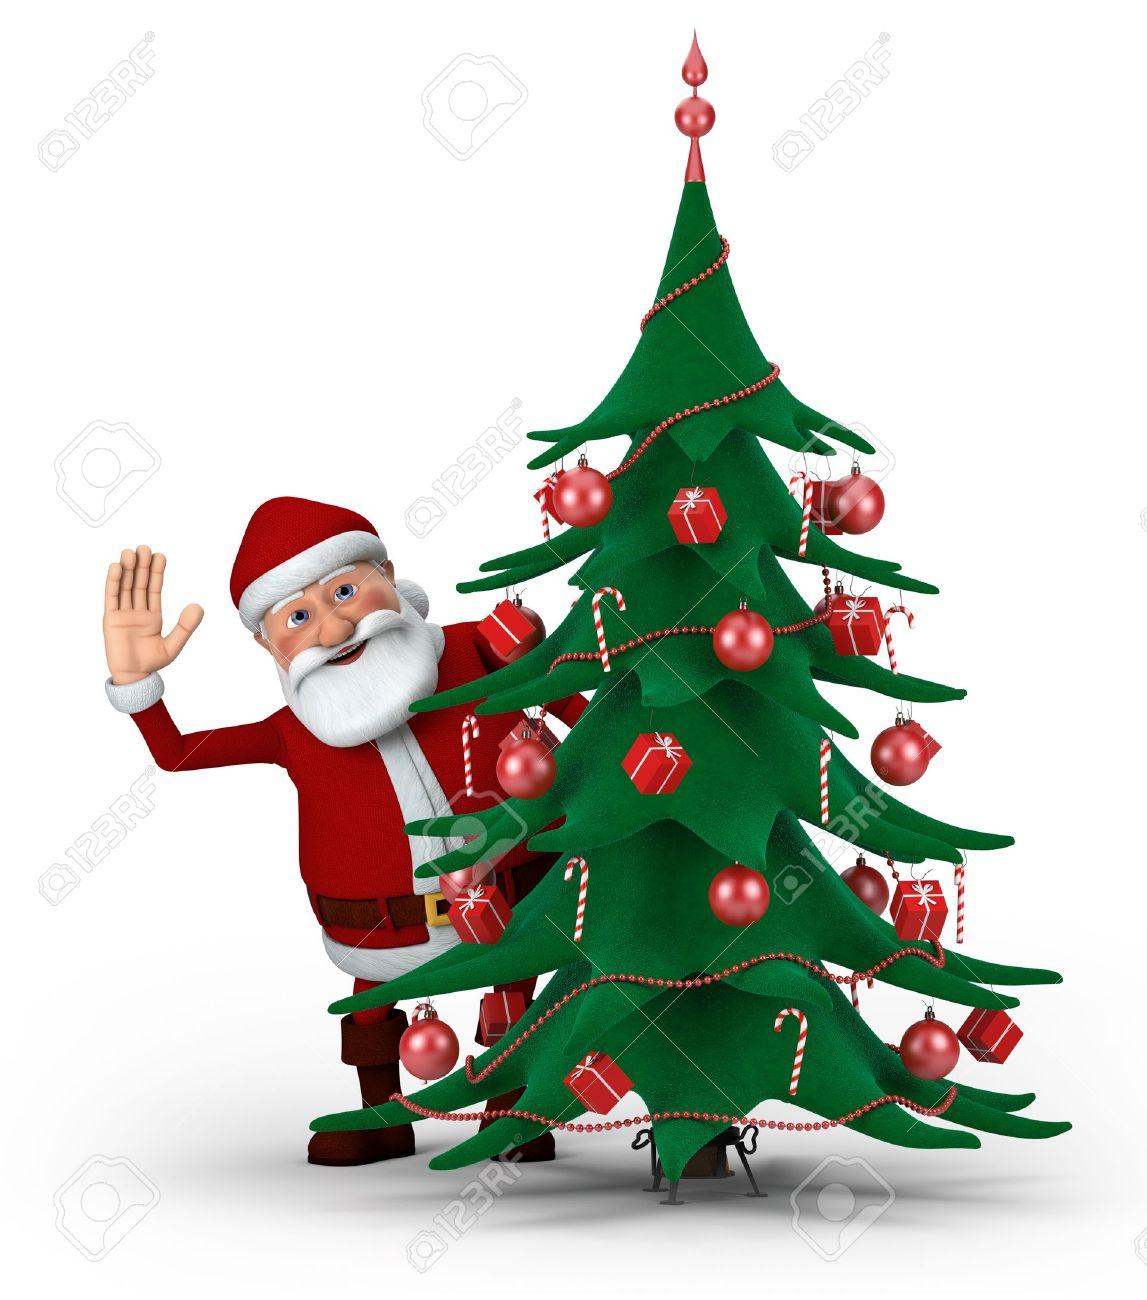 Cartoon Santa Claus Waving From Behind Christmas Tree High  - Quality Christmas Tree